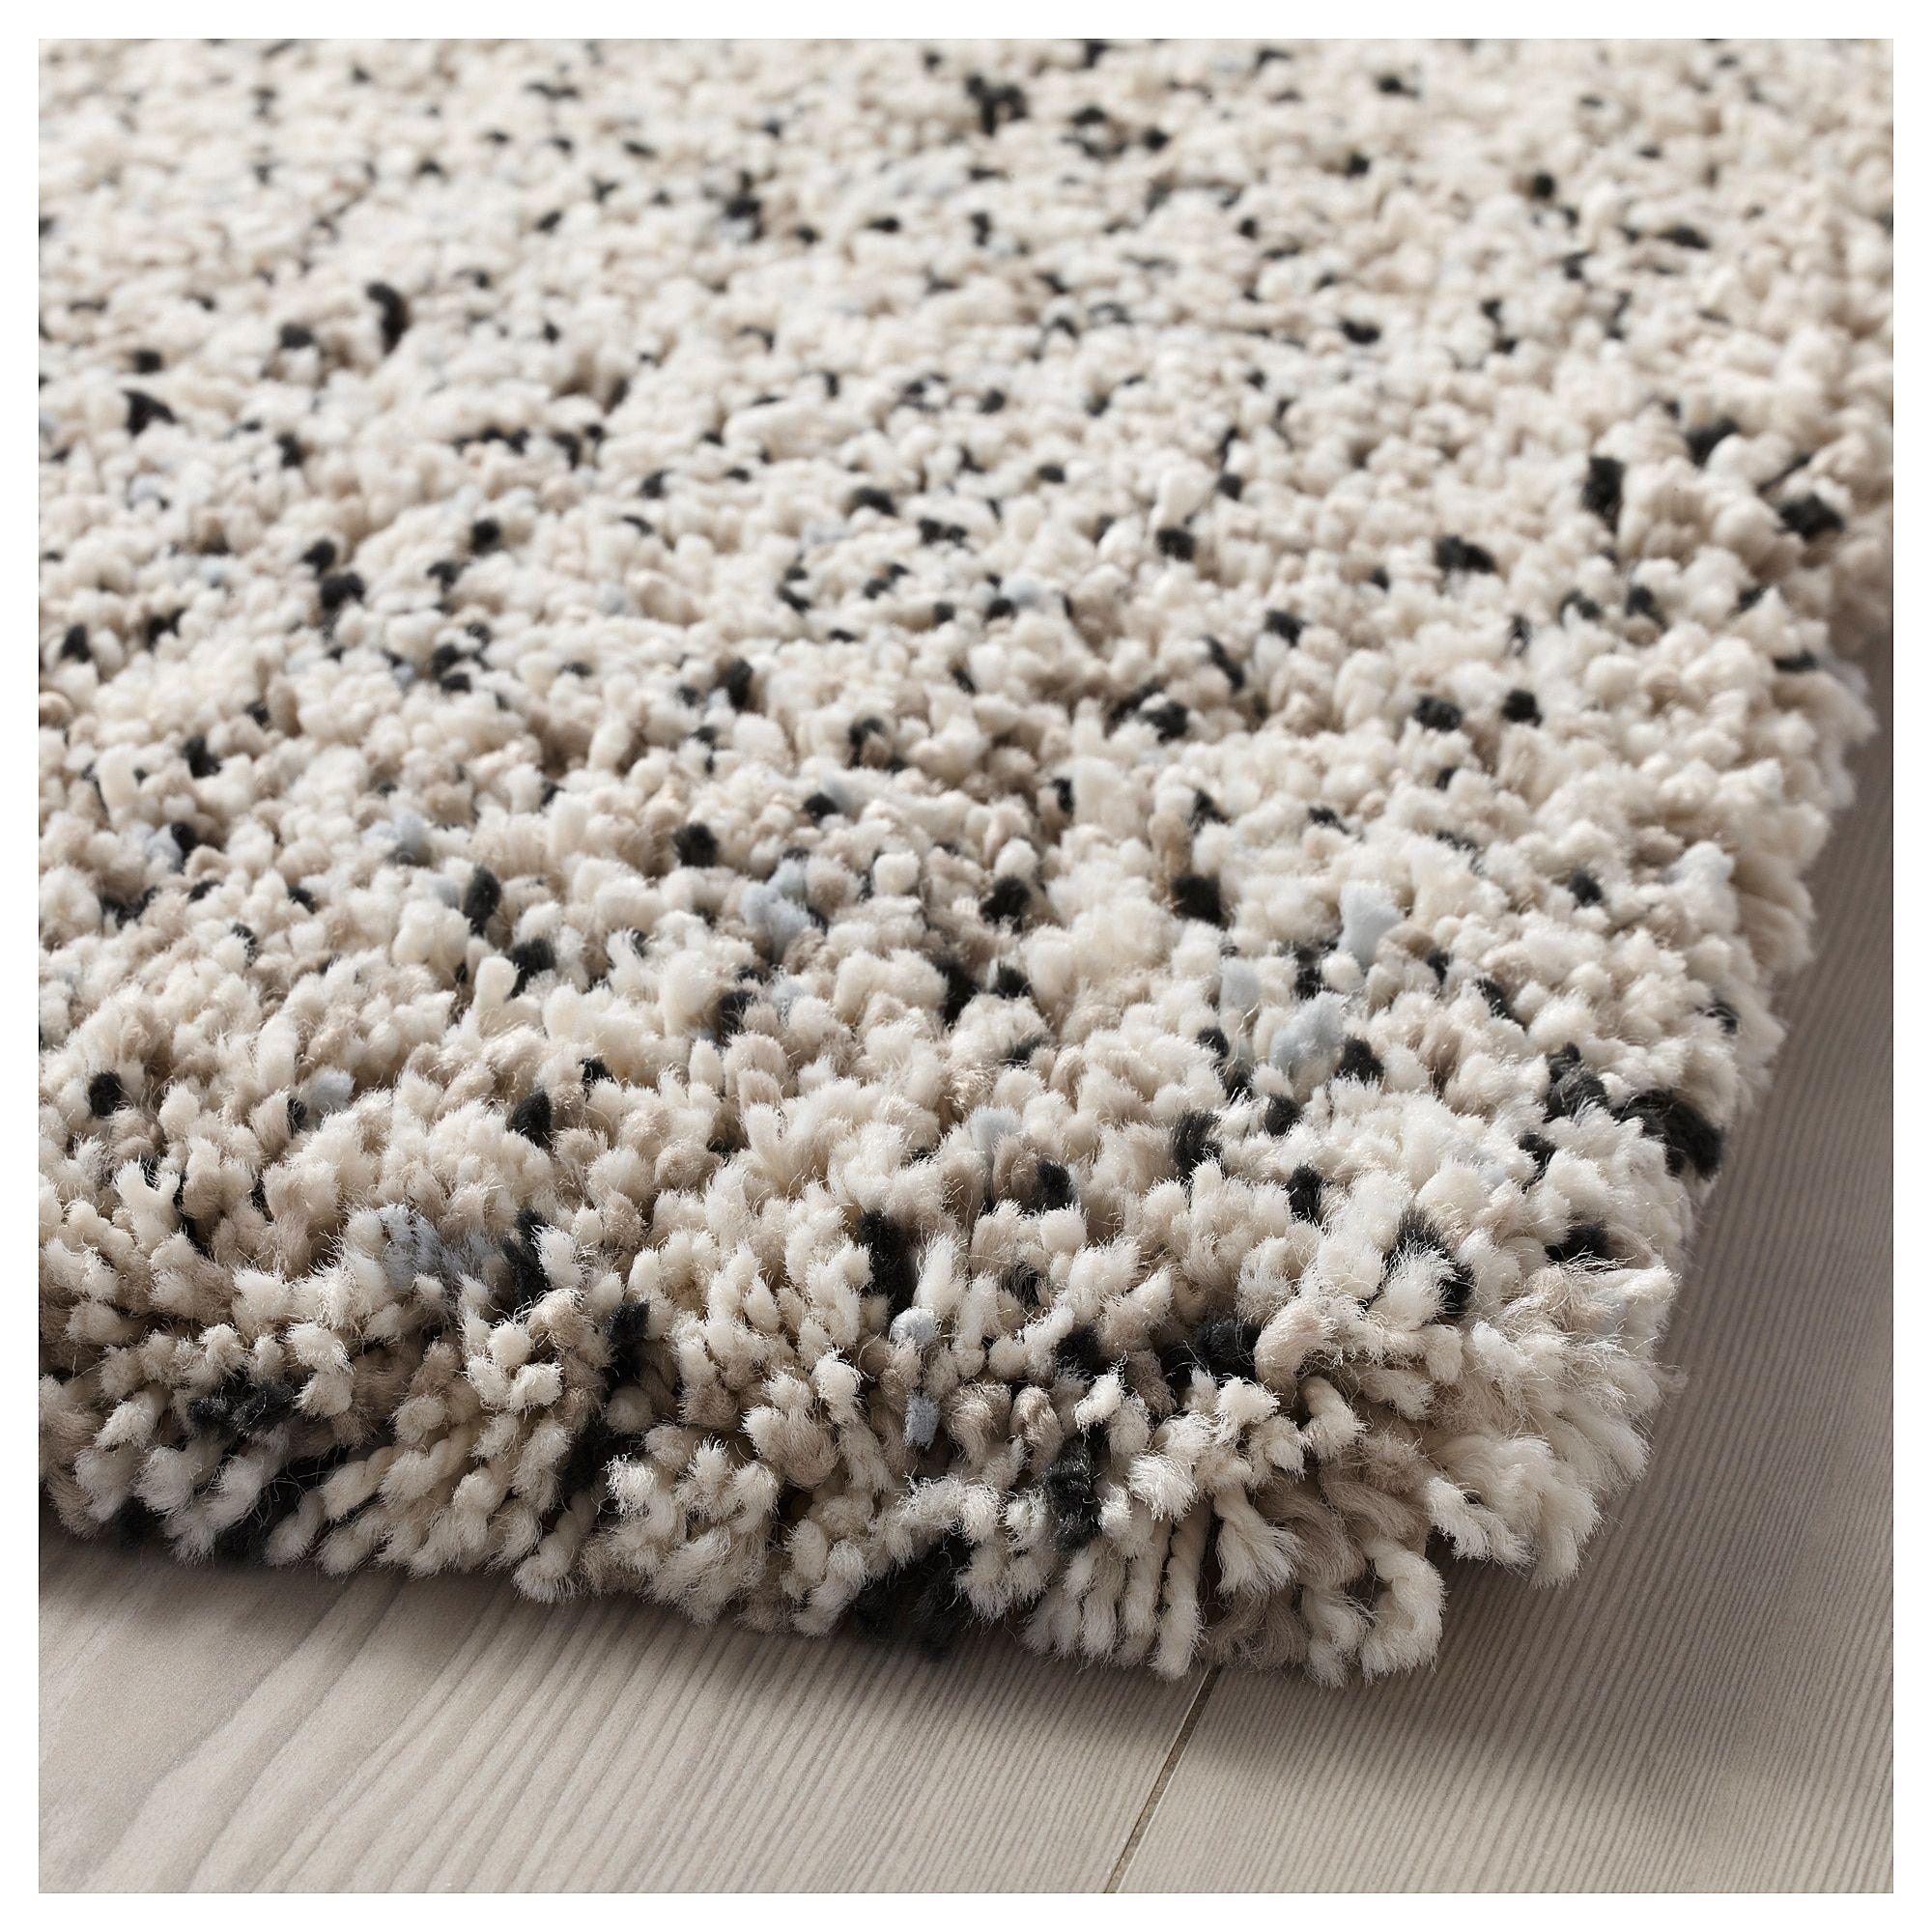 Vindum White Rug High Pile 170x230 Cm Ikea Ikea Rug Plush Carpet Rugs